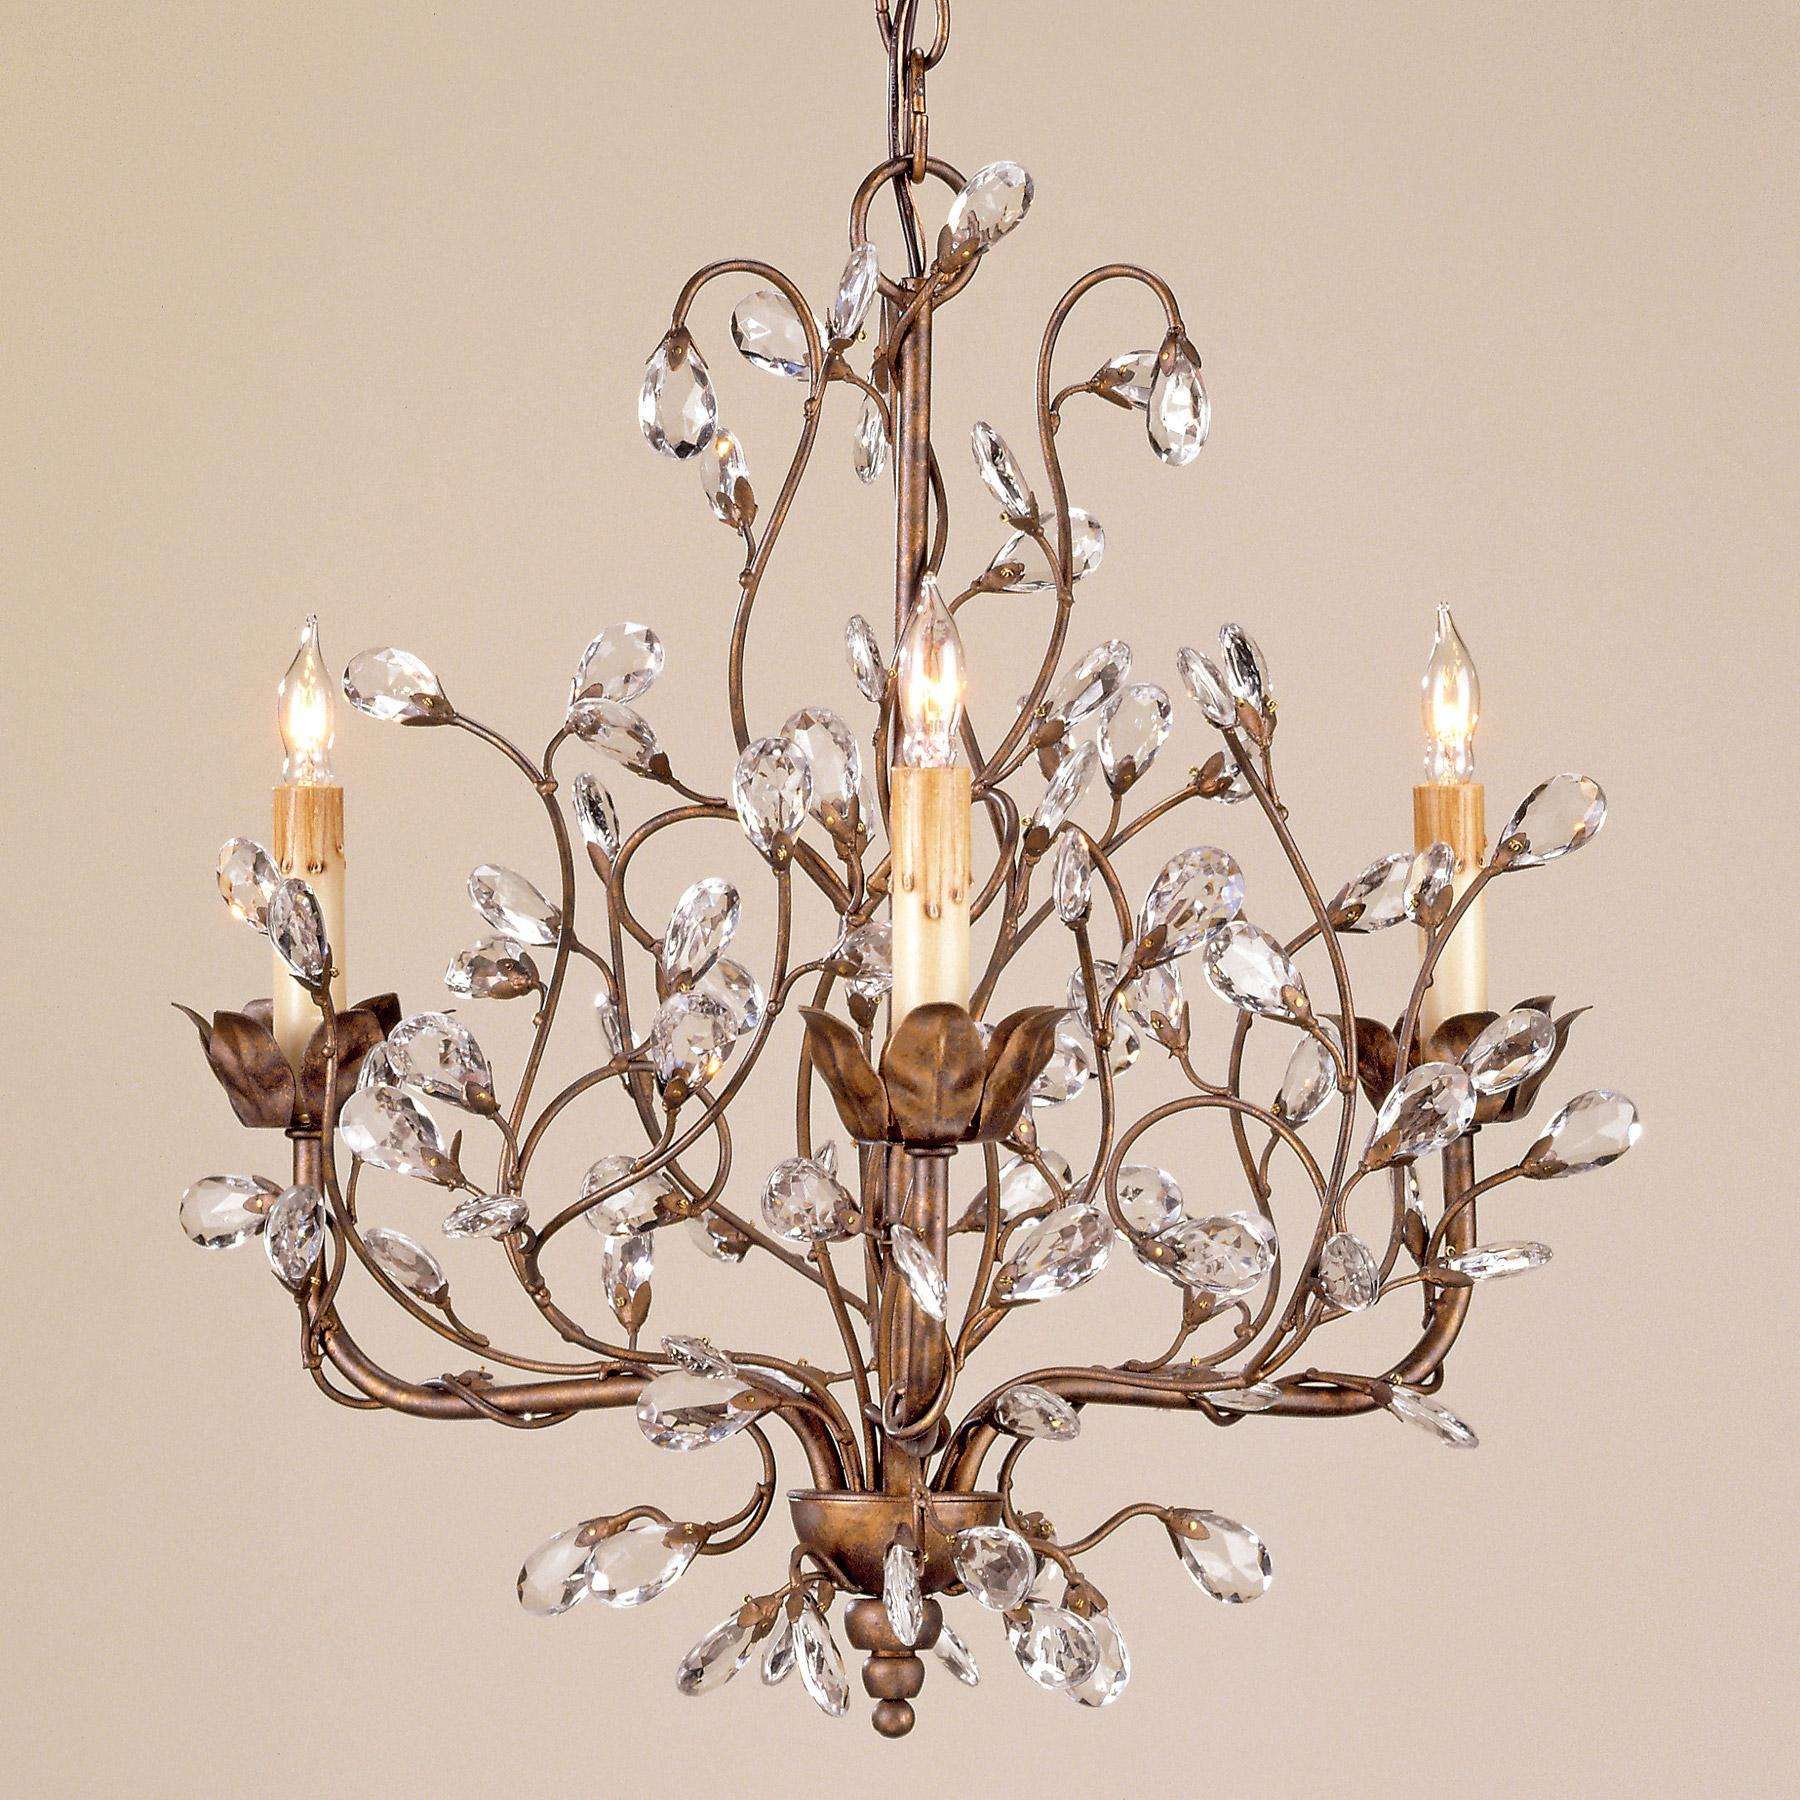 Currey and company 9883 crystal crystal bud mini chandelier aloadofball Choice Image